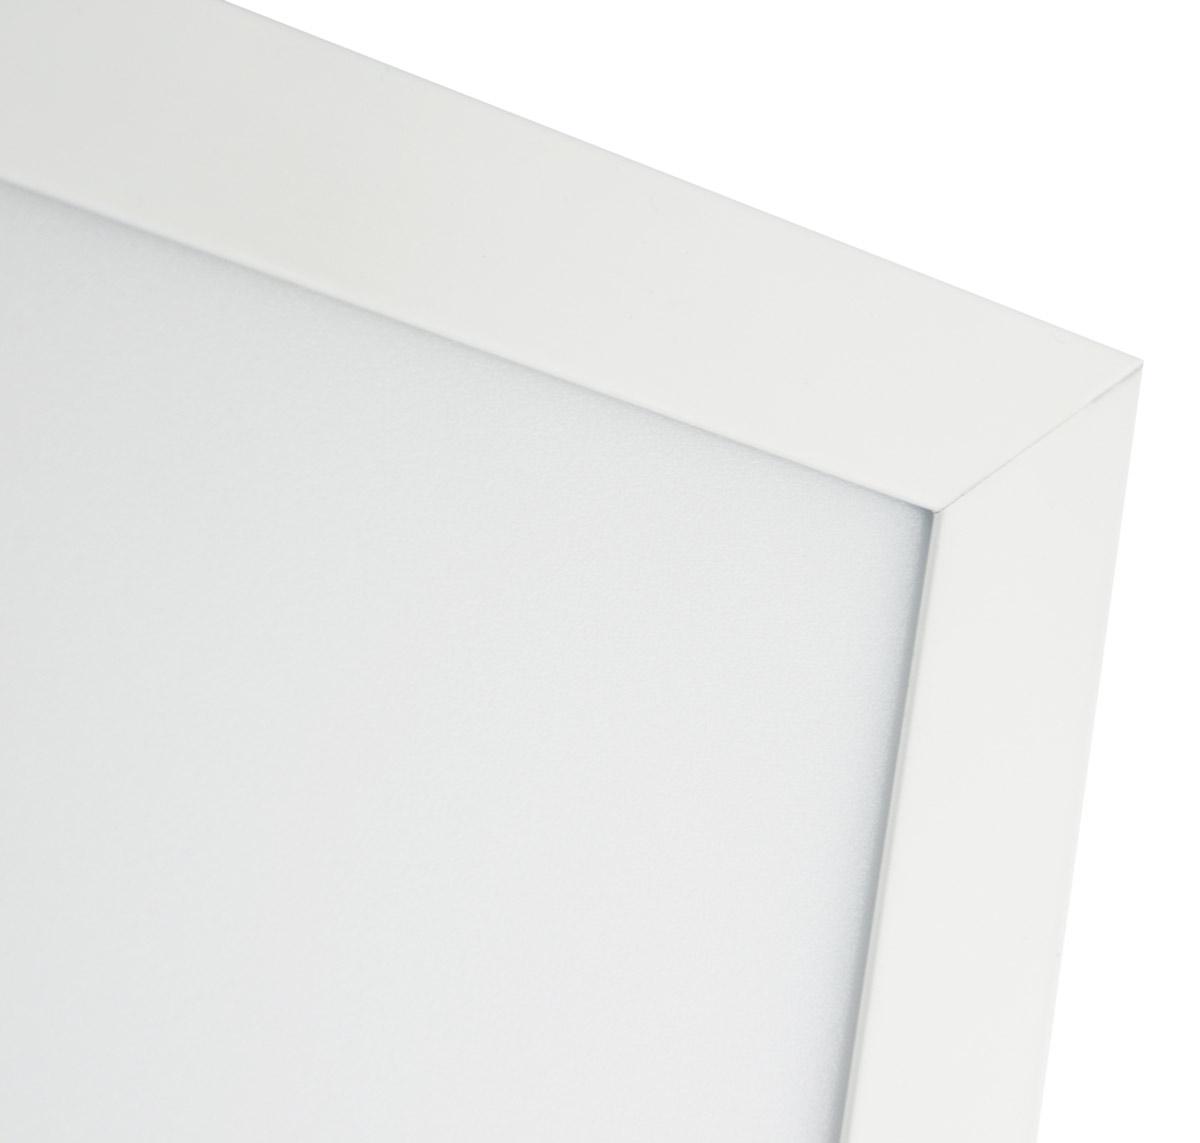 Mero Square LED Panel